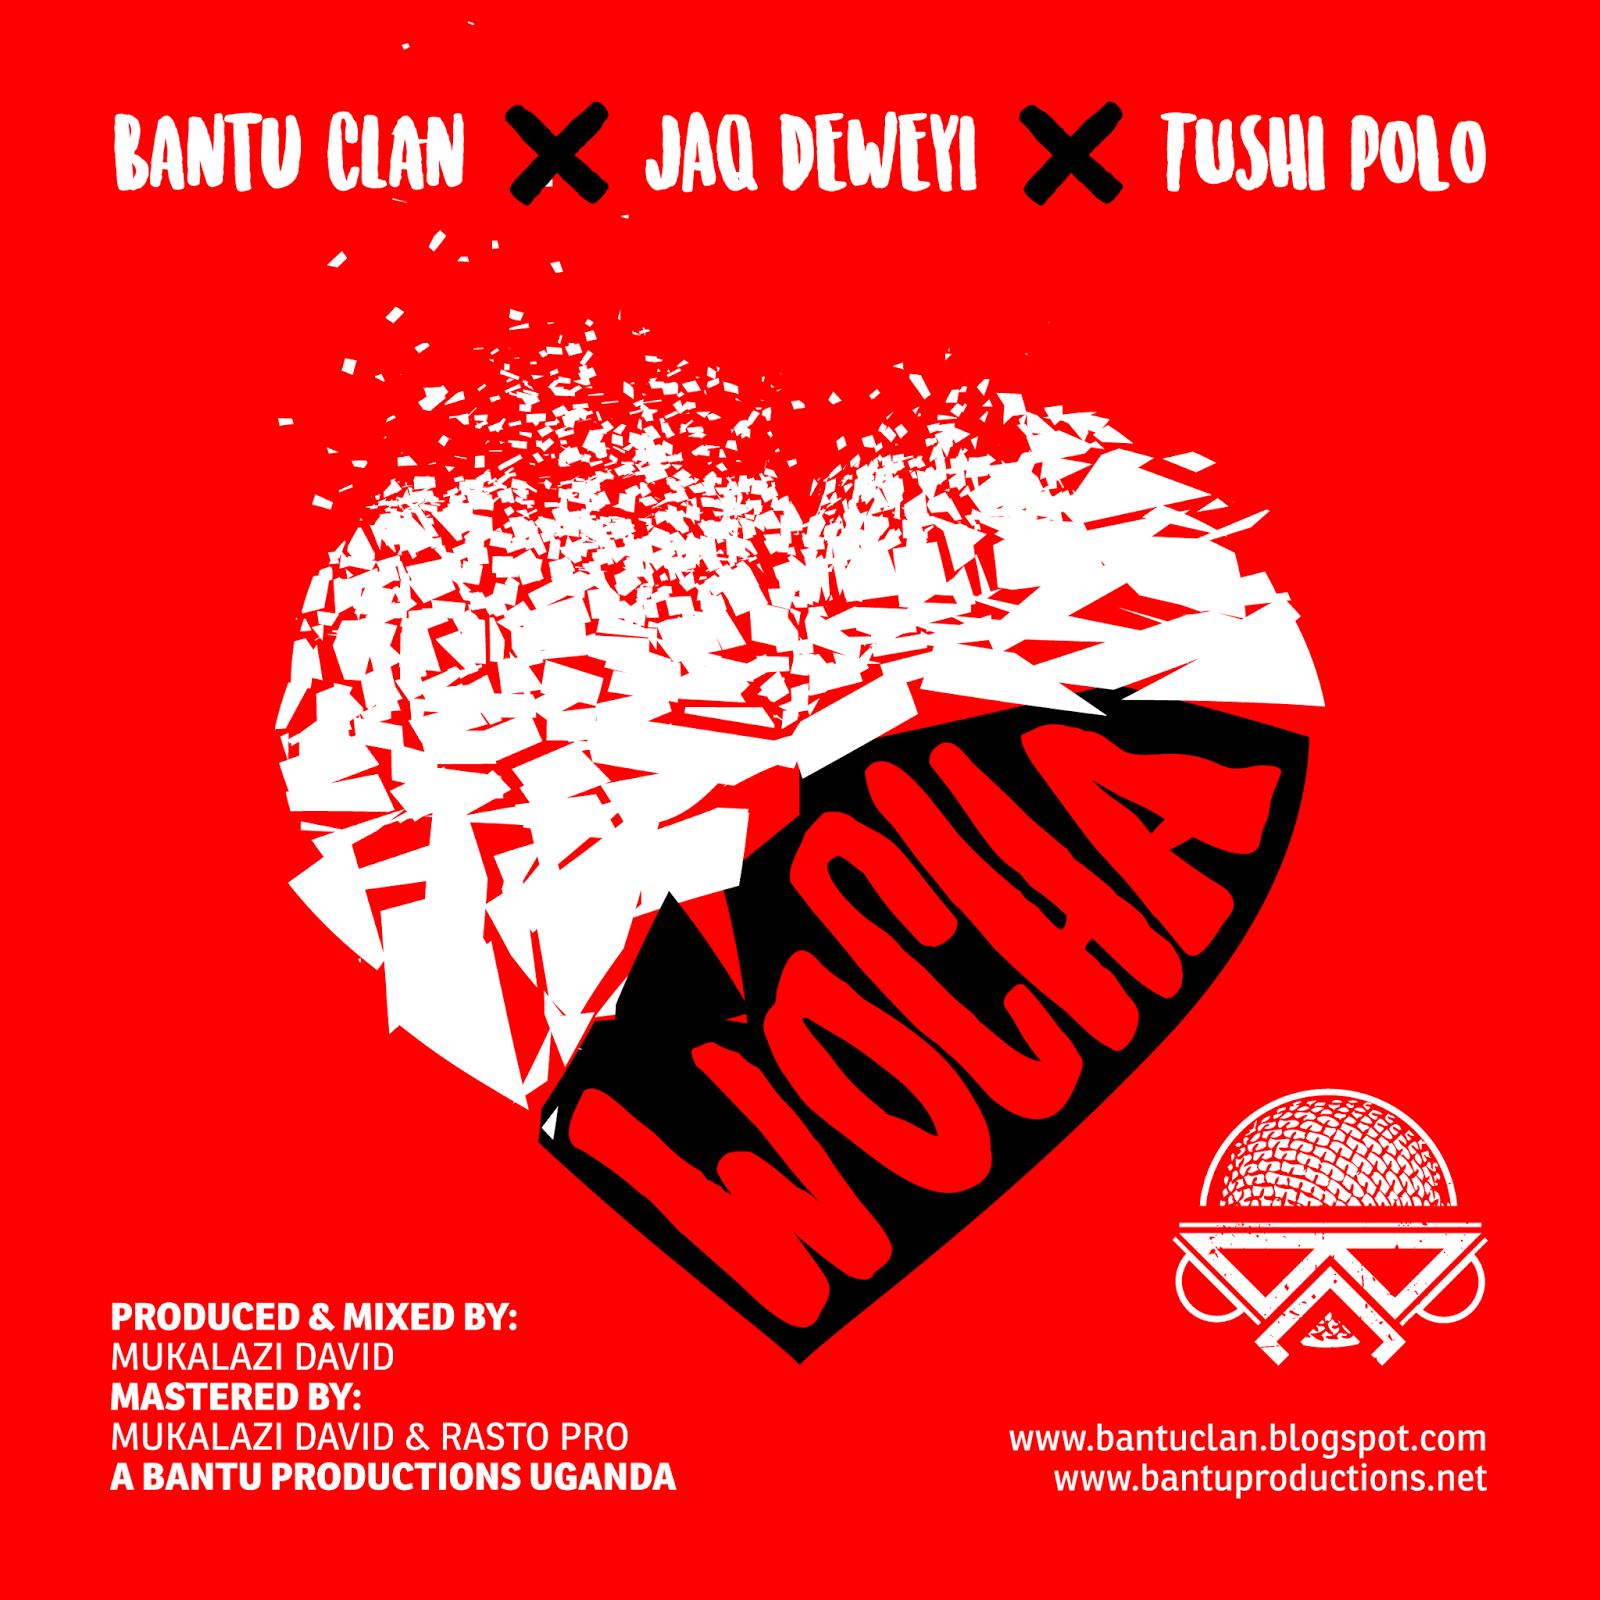 YUDAH-BANTU CLAN THE TRIBE SONG PREVIEW | Bantu Clan